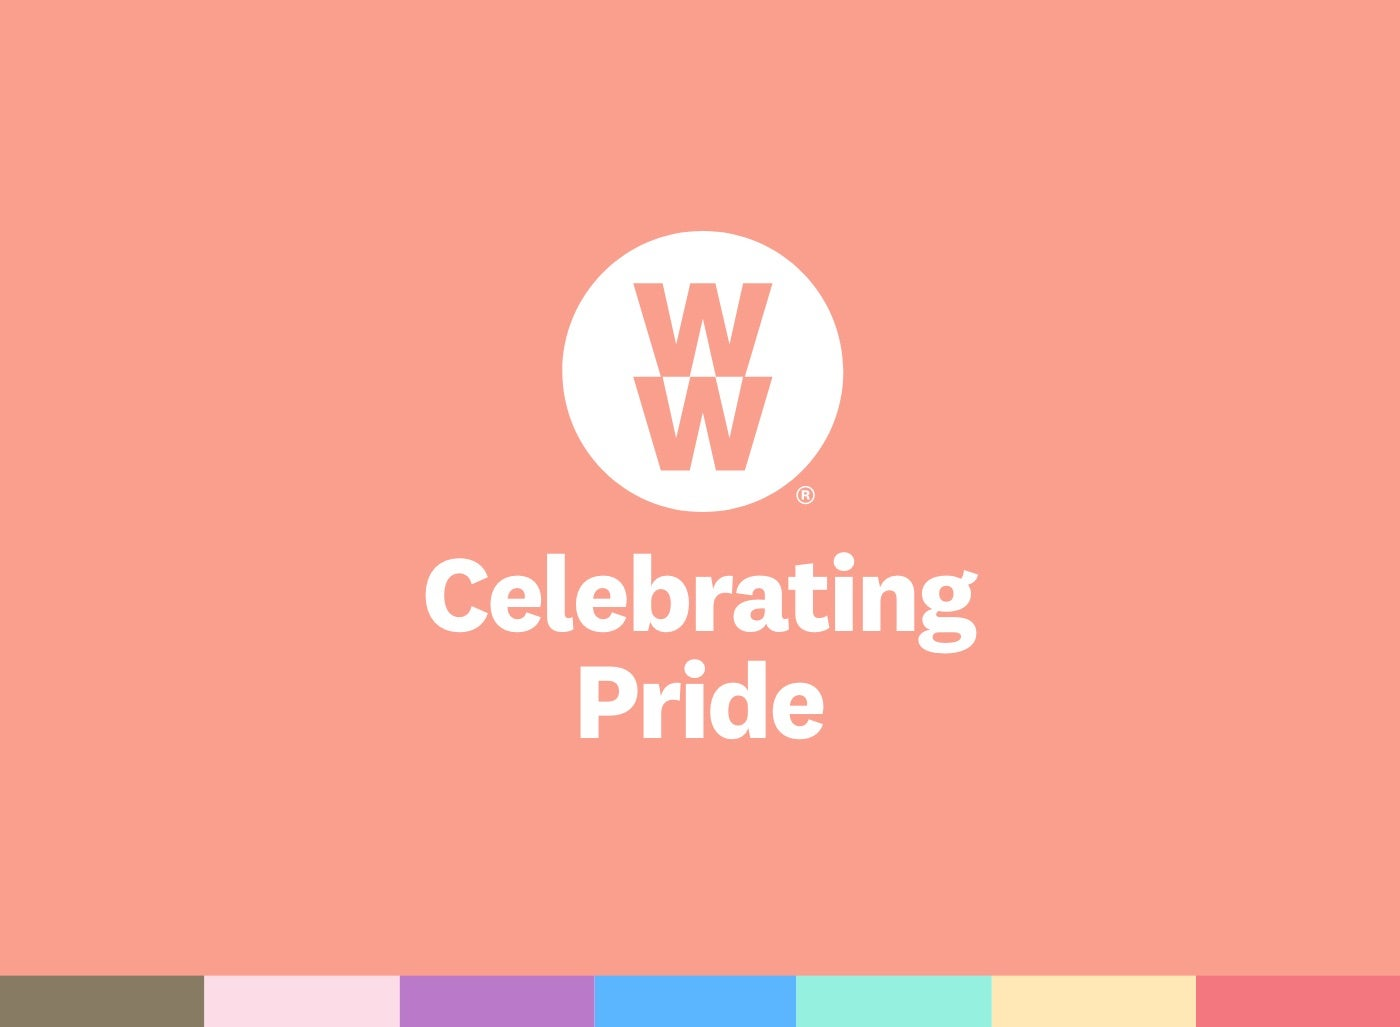 WW is celebrating Pride month.